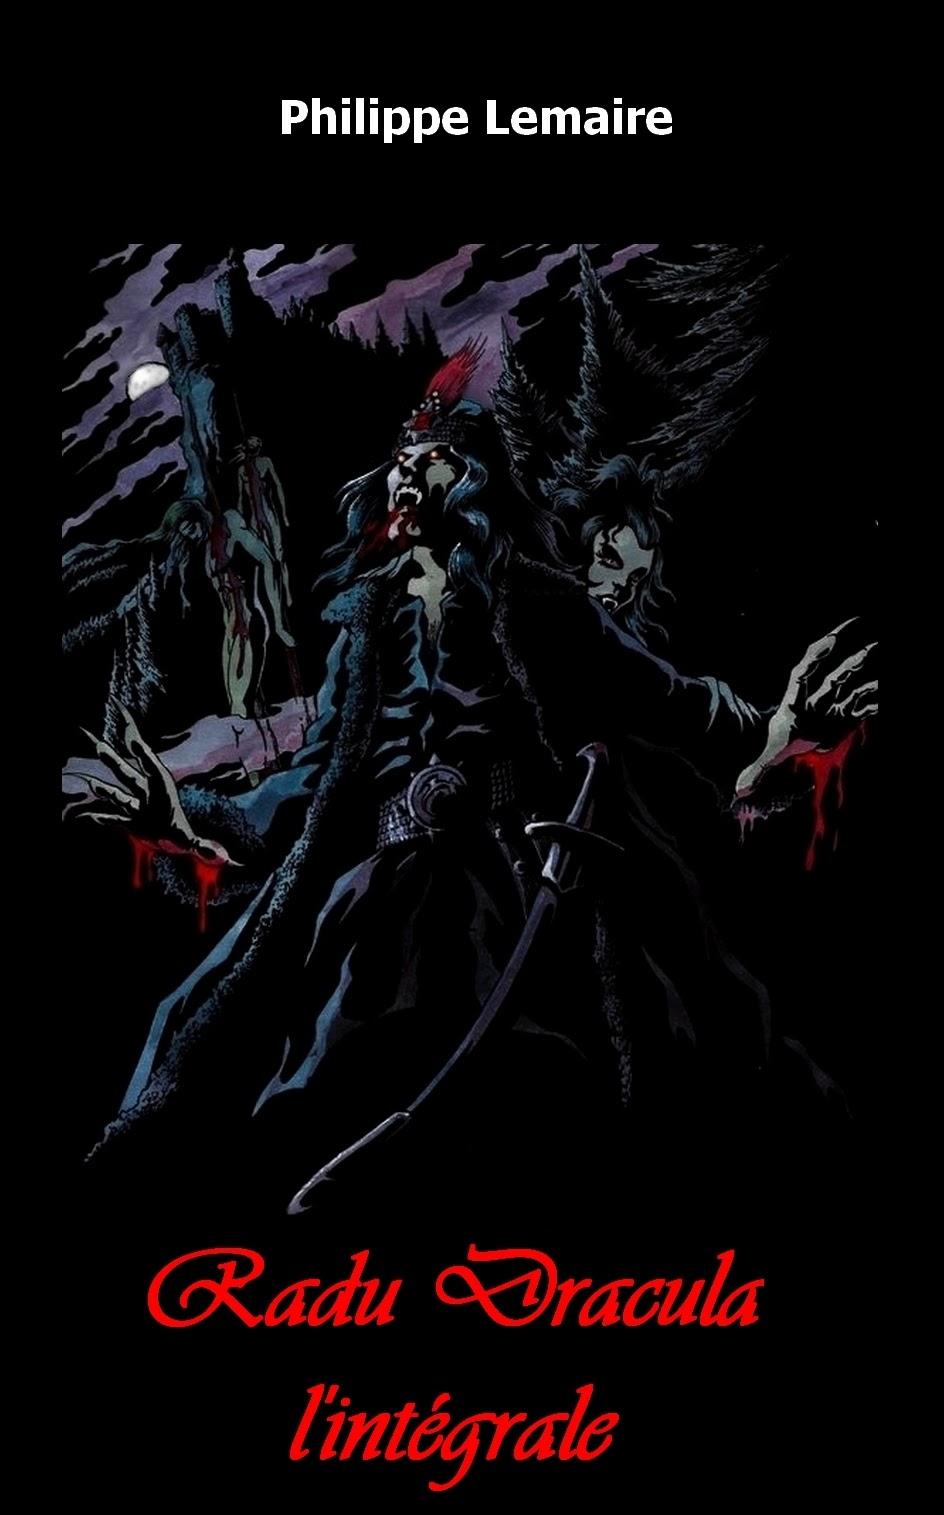 Radu Dracula intégrale